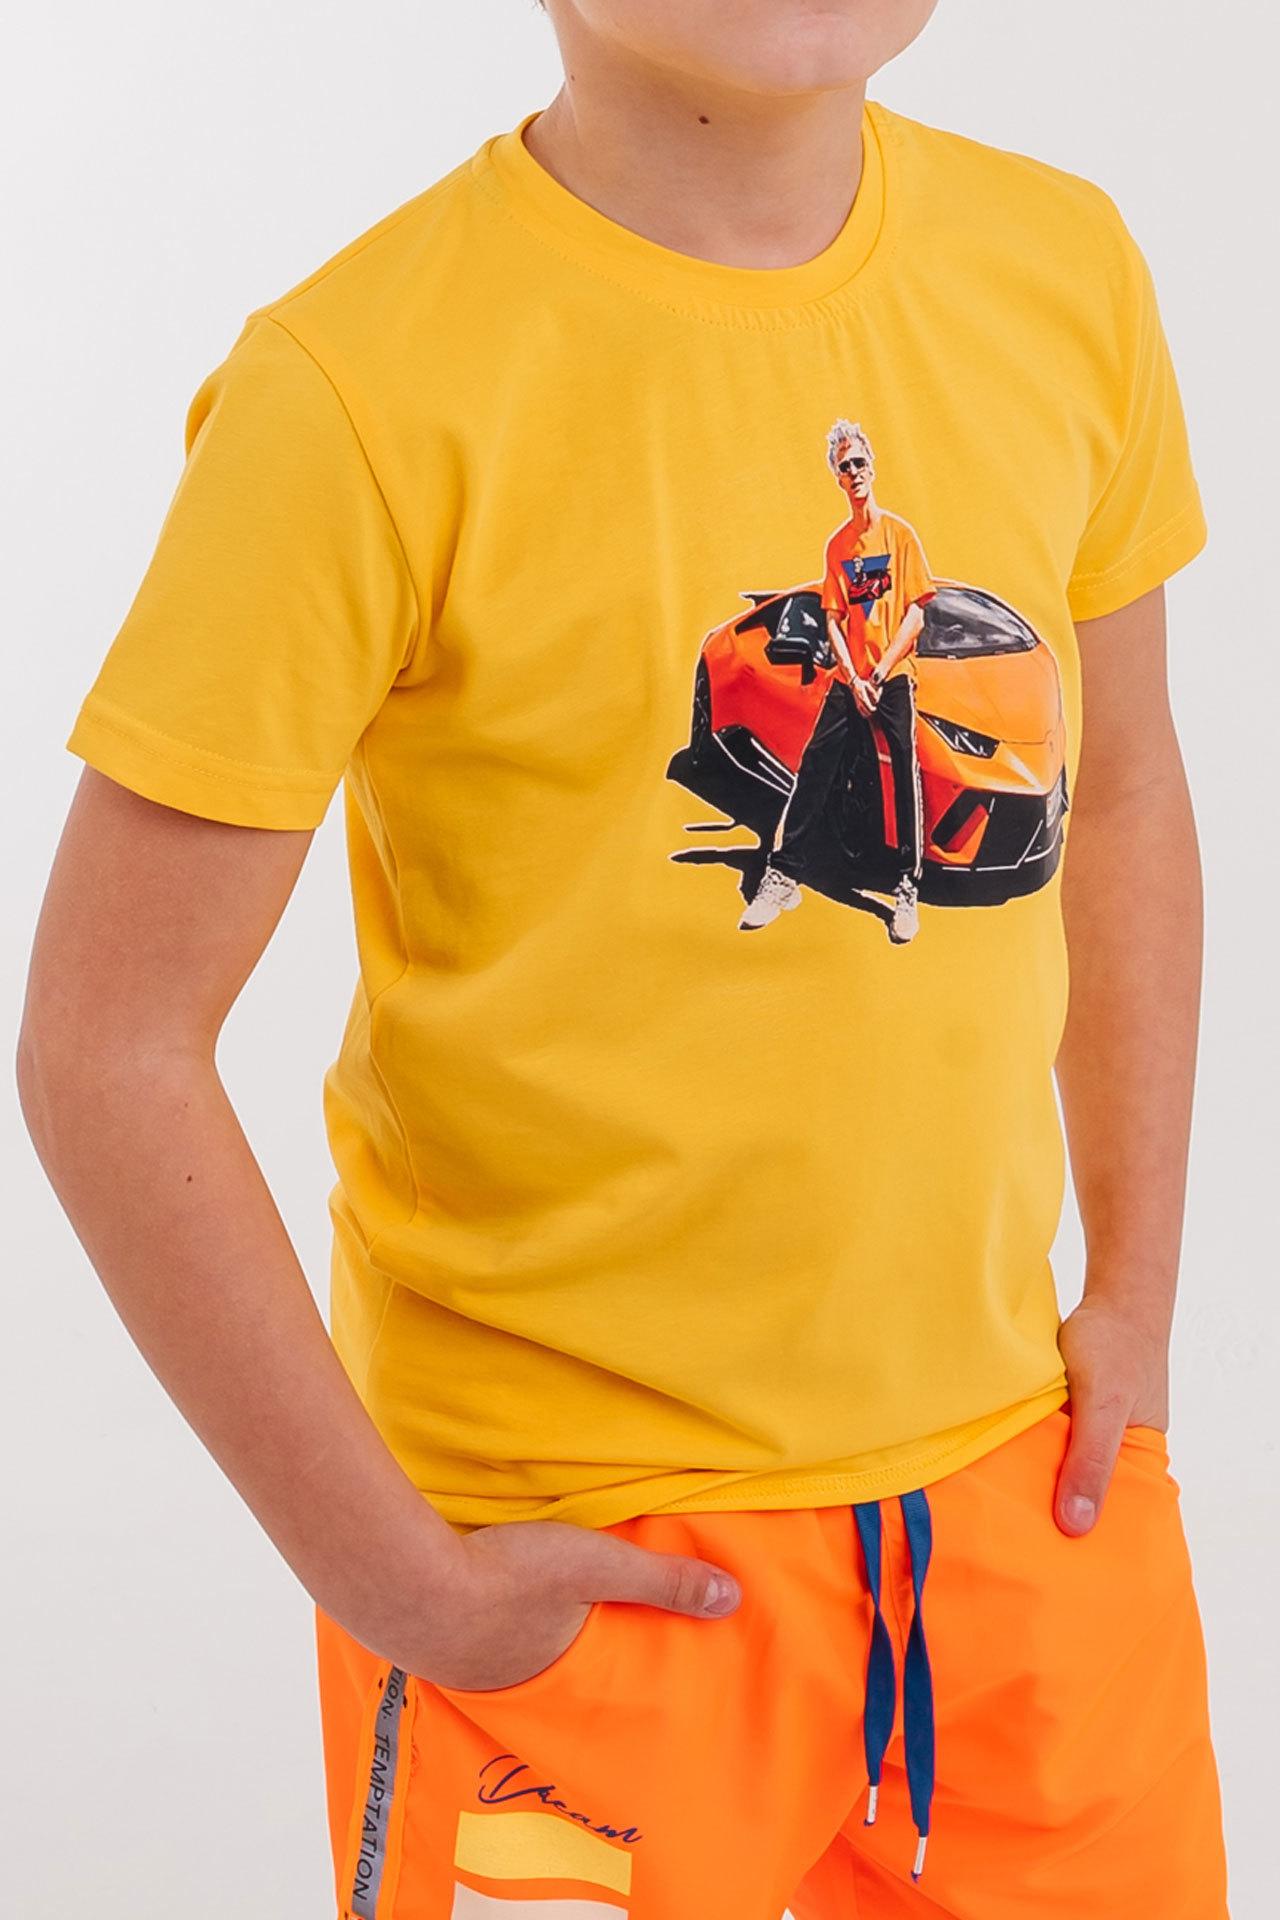 Футболка для мальчика A4 Lamborgini Bold Турция, 160-21 (116-134)